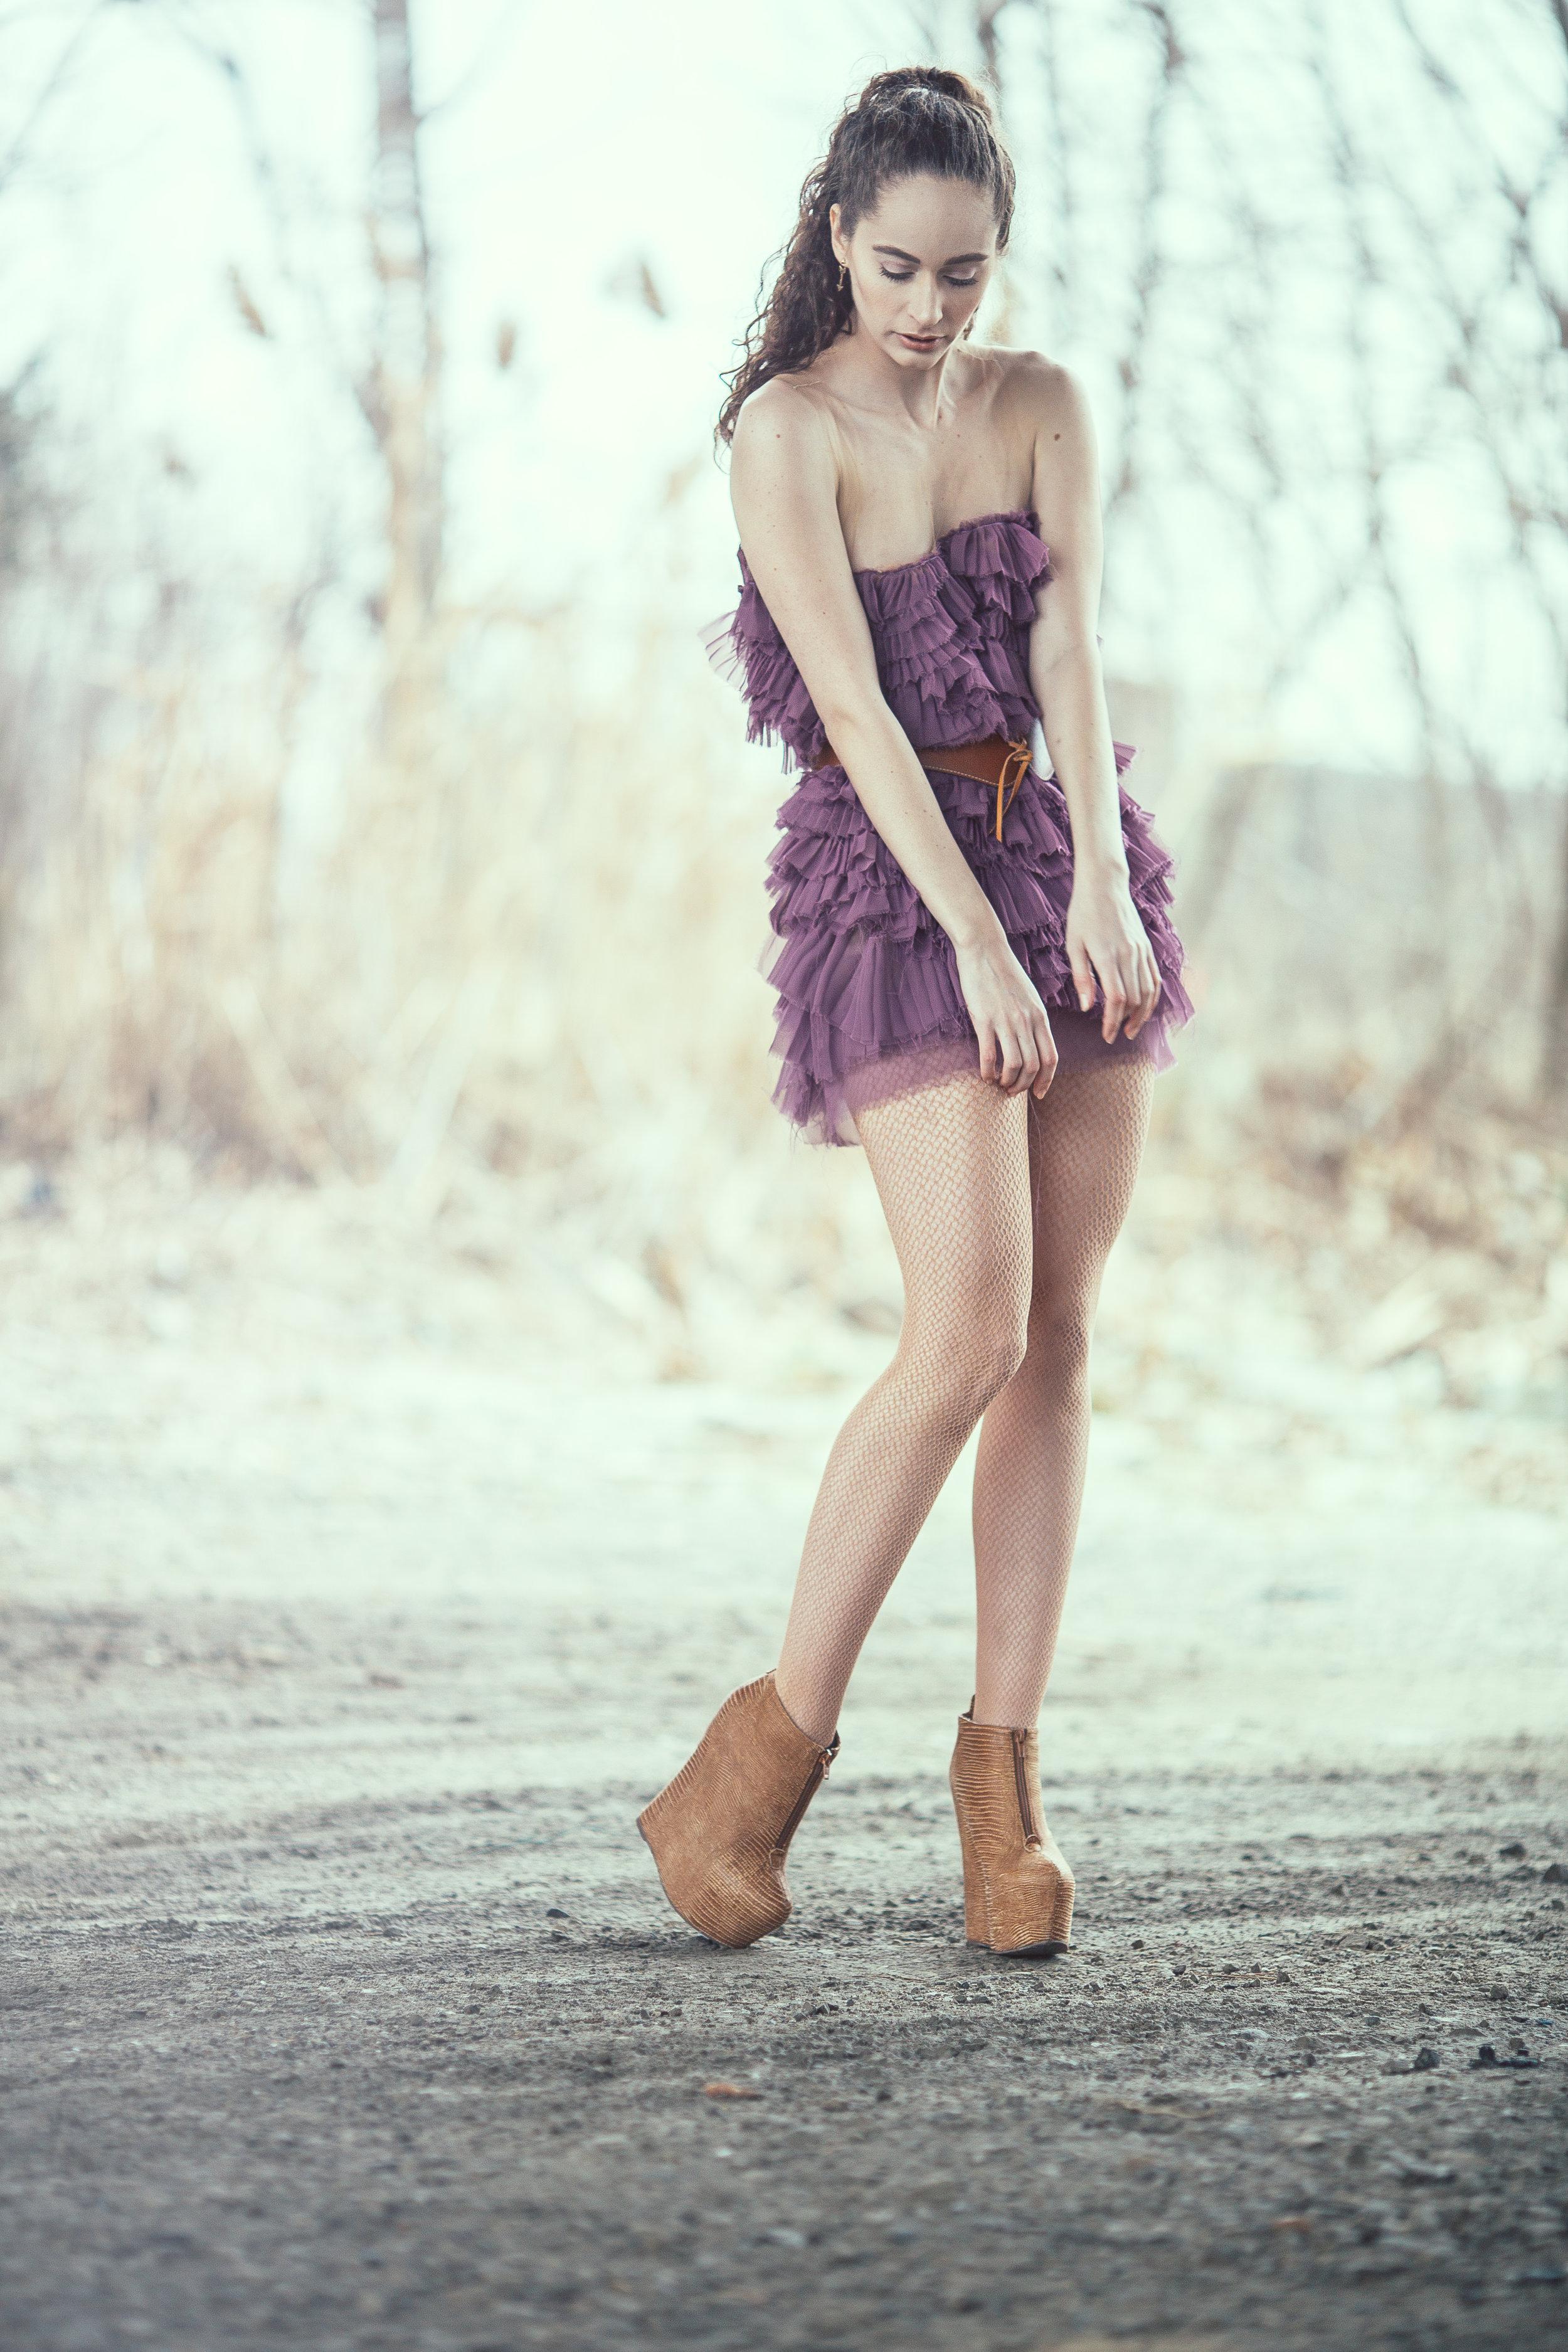 Pauline Fashion Editorial, tester shoot in purple dress  Detroit Photography, Fashion, Editorial